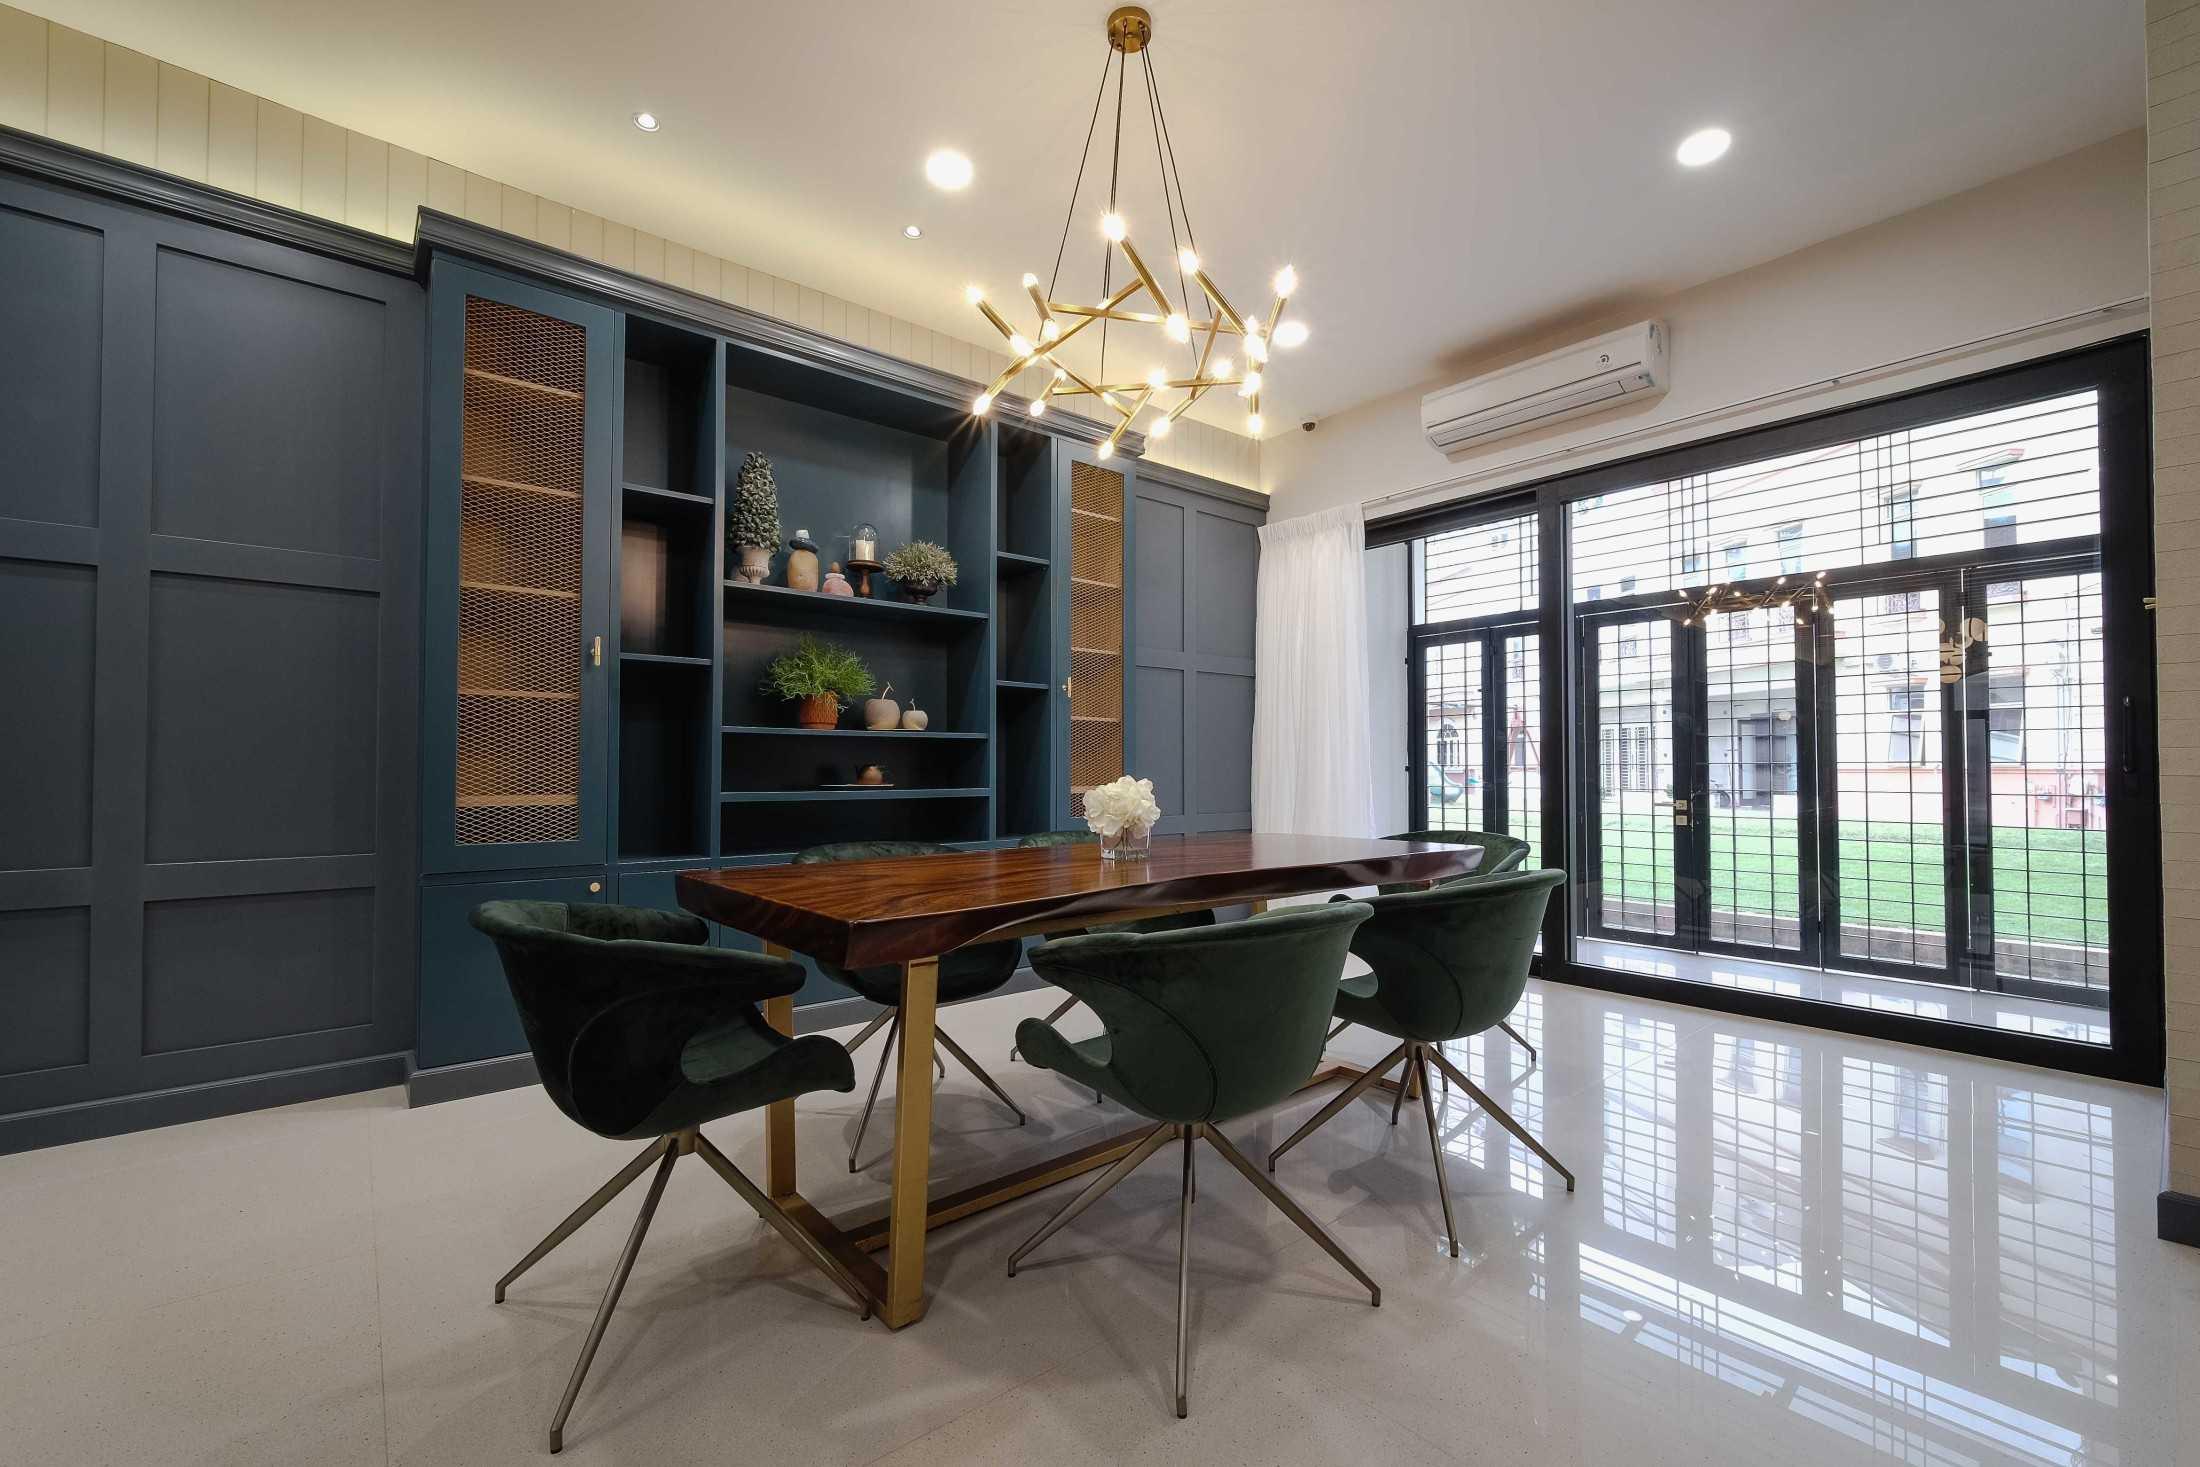 Studio Alo House H Medan, Kota Medan, Sumatera Utara, Indonesia Medan, Kota Medan, Sumatera Utara, Indonesia Ranch Style Residential  115661